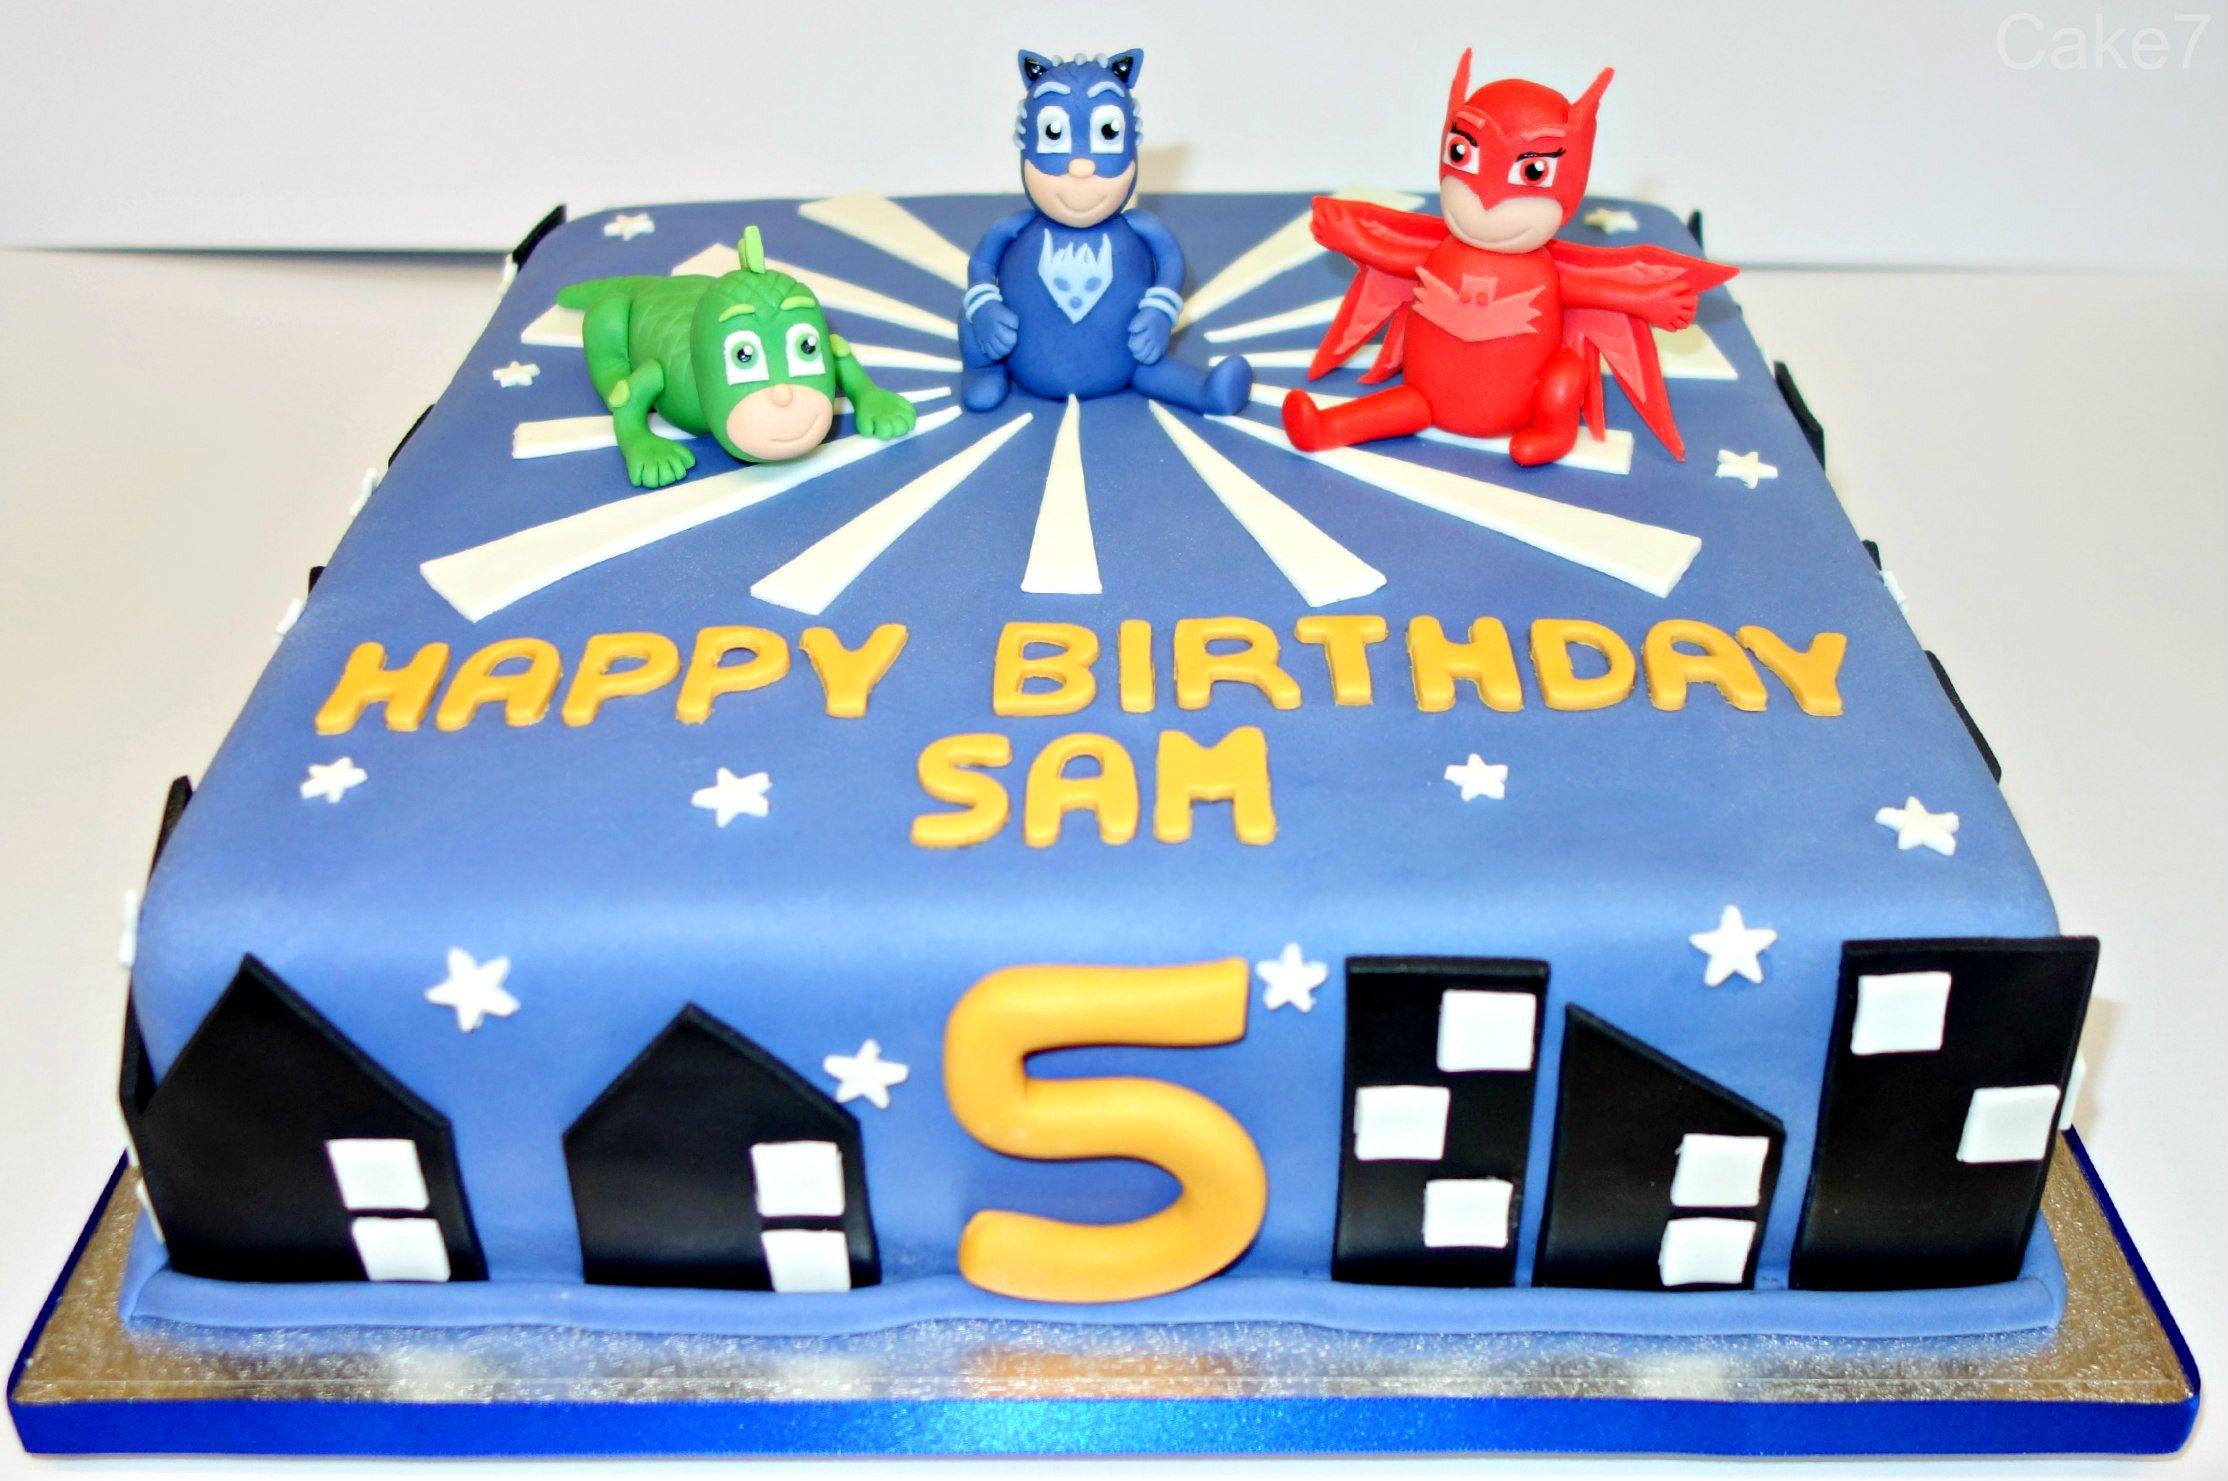 Pj Masks Themed Cake Www Cakeseven Wix Facebook Cake7